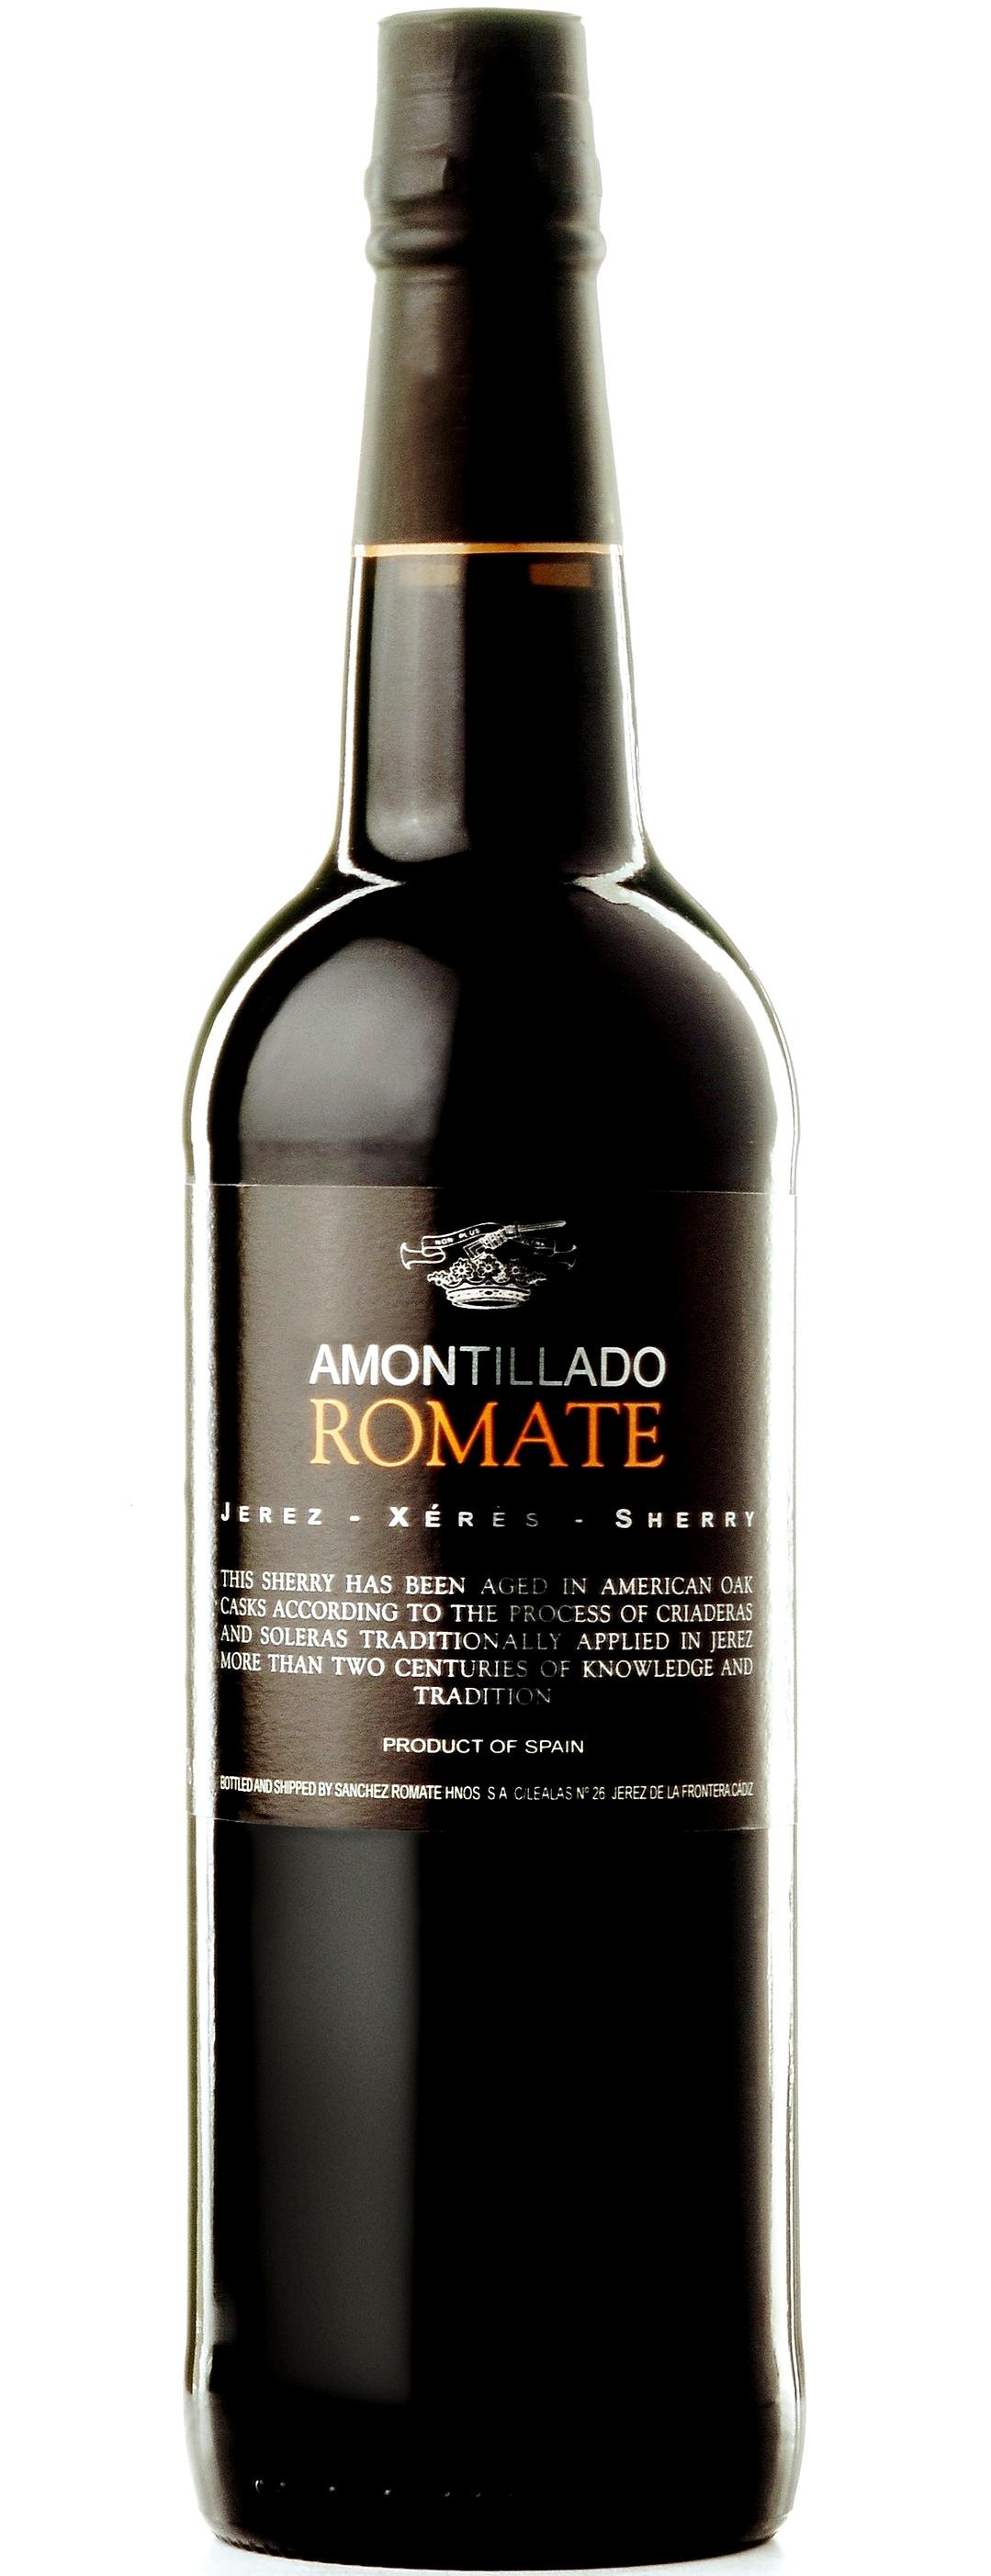 Romate Amontillado Sherry 75cl